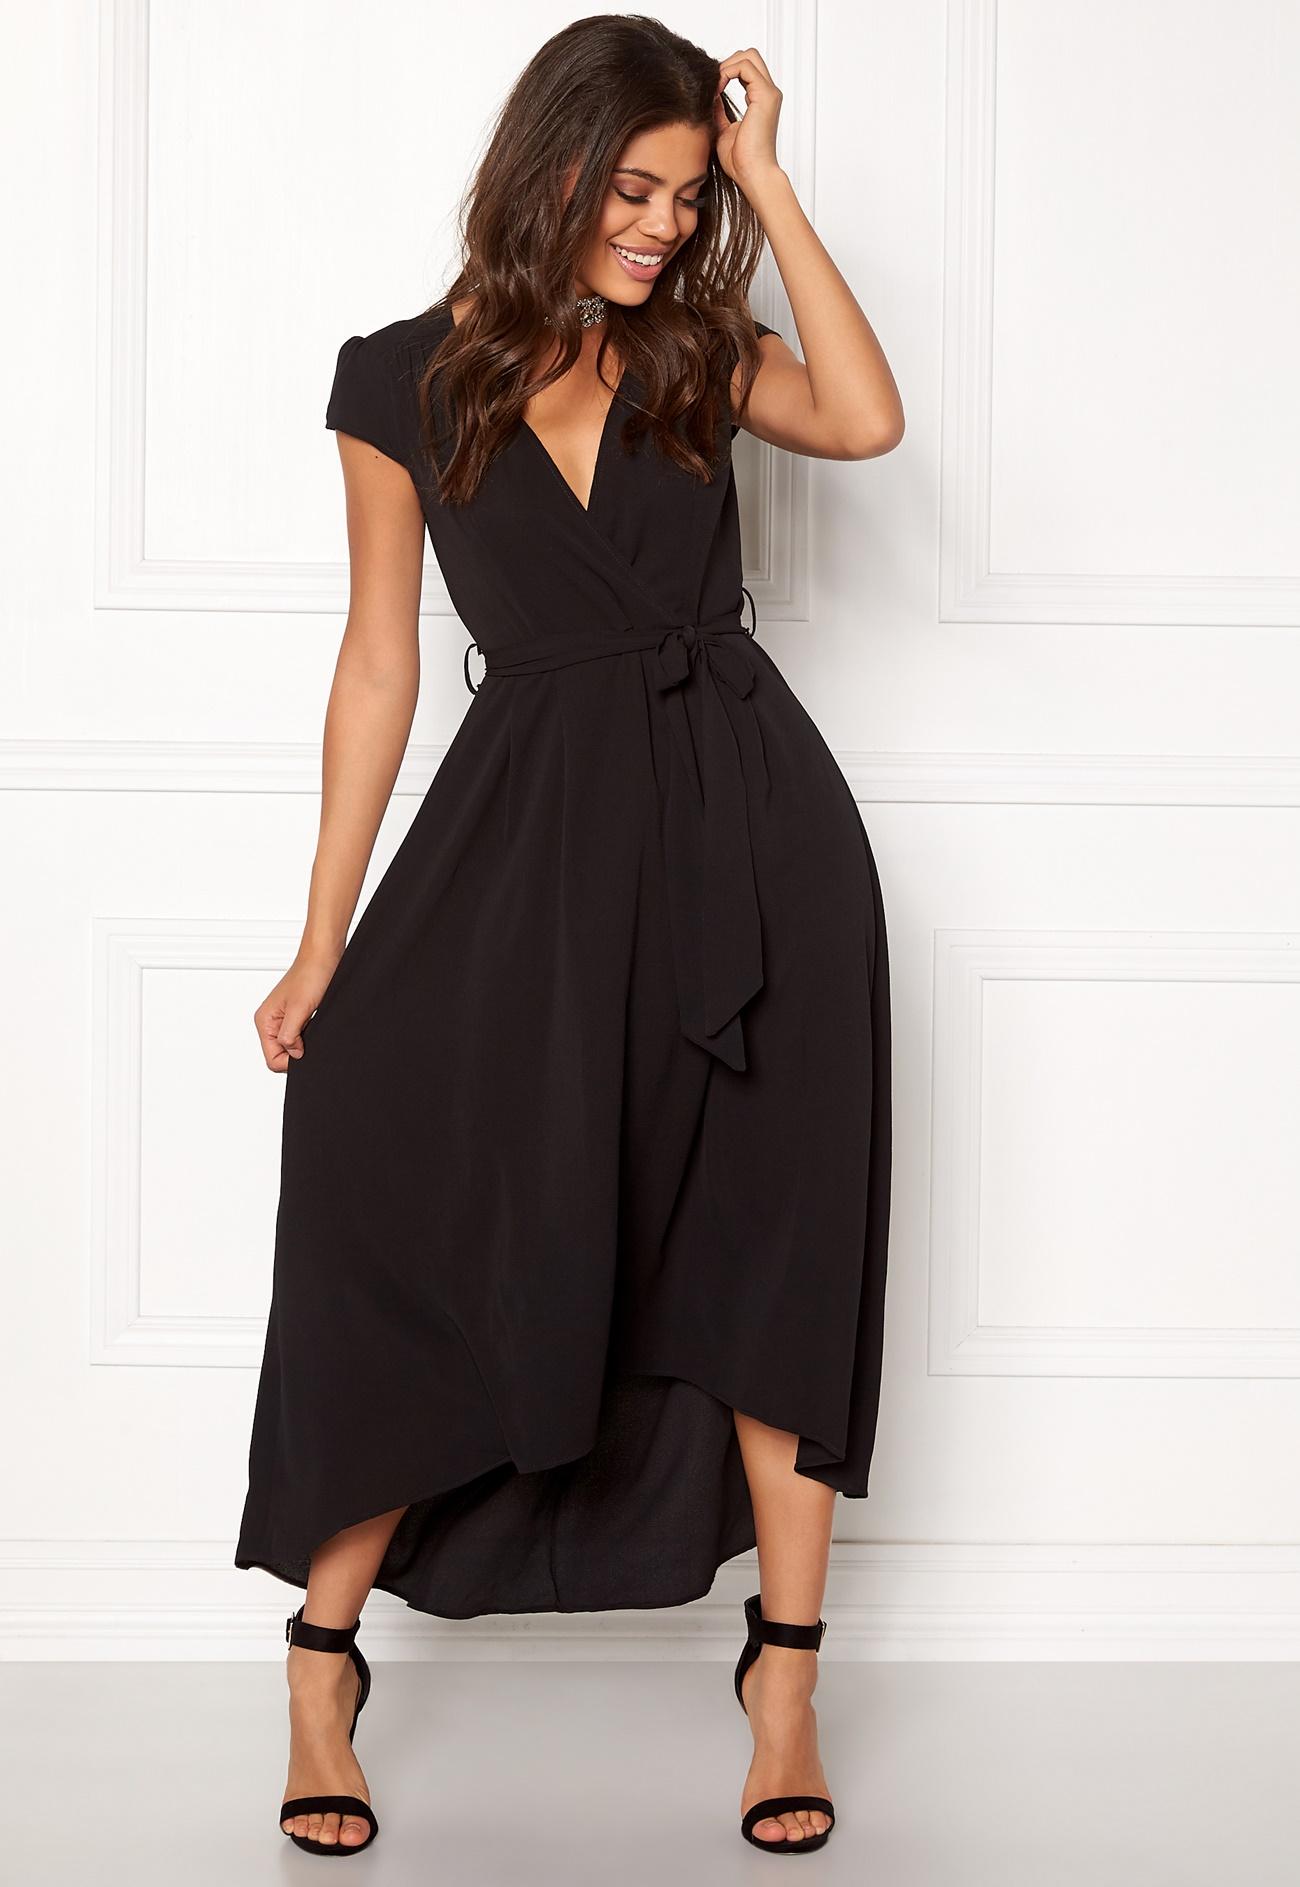 Ax paris cap waterfall dress black bubbleroom for Waterfall design dress